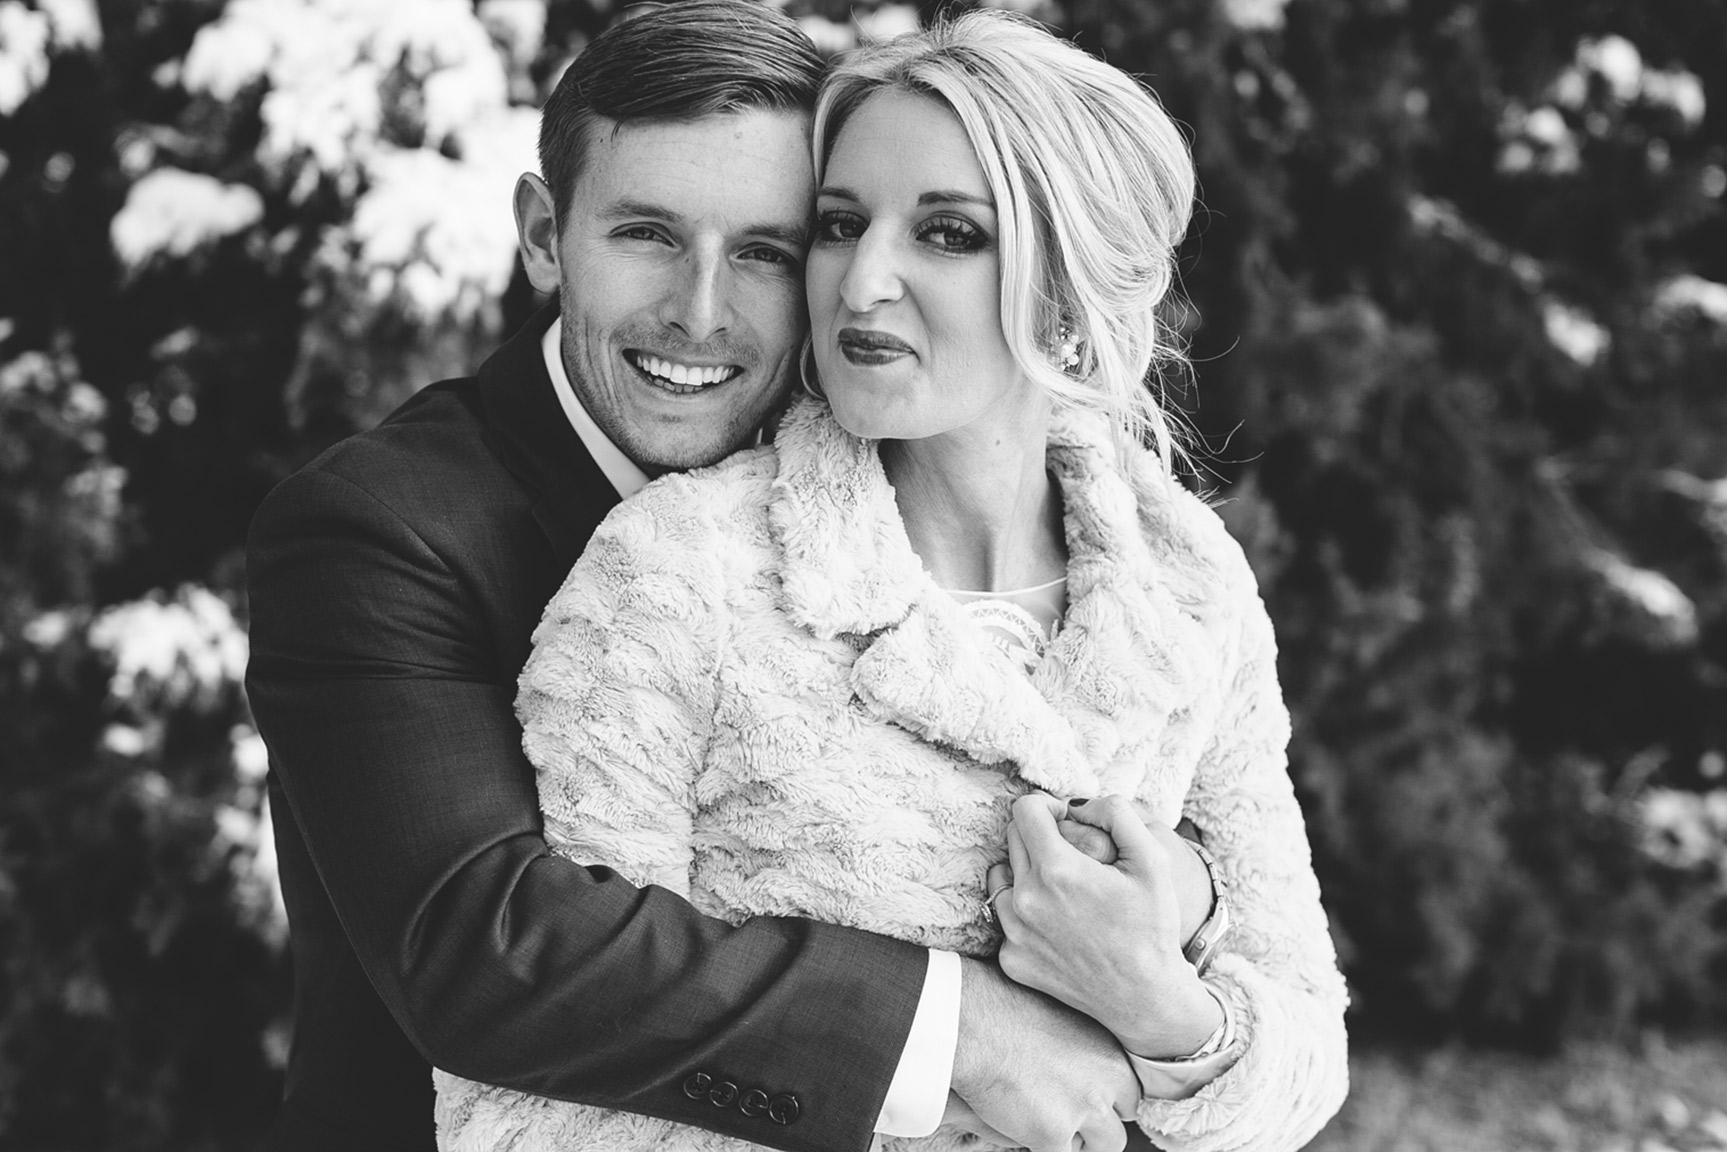 Cotton_Creek_Barn_Winter_Wedding_WeddingPhotographer023.jpg